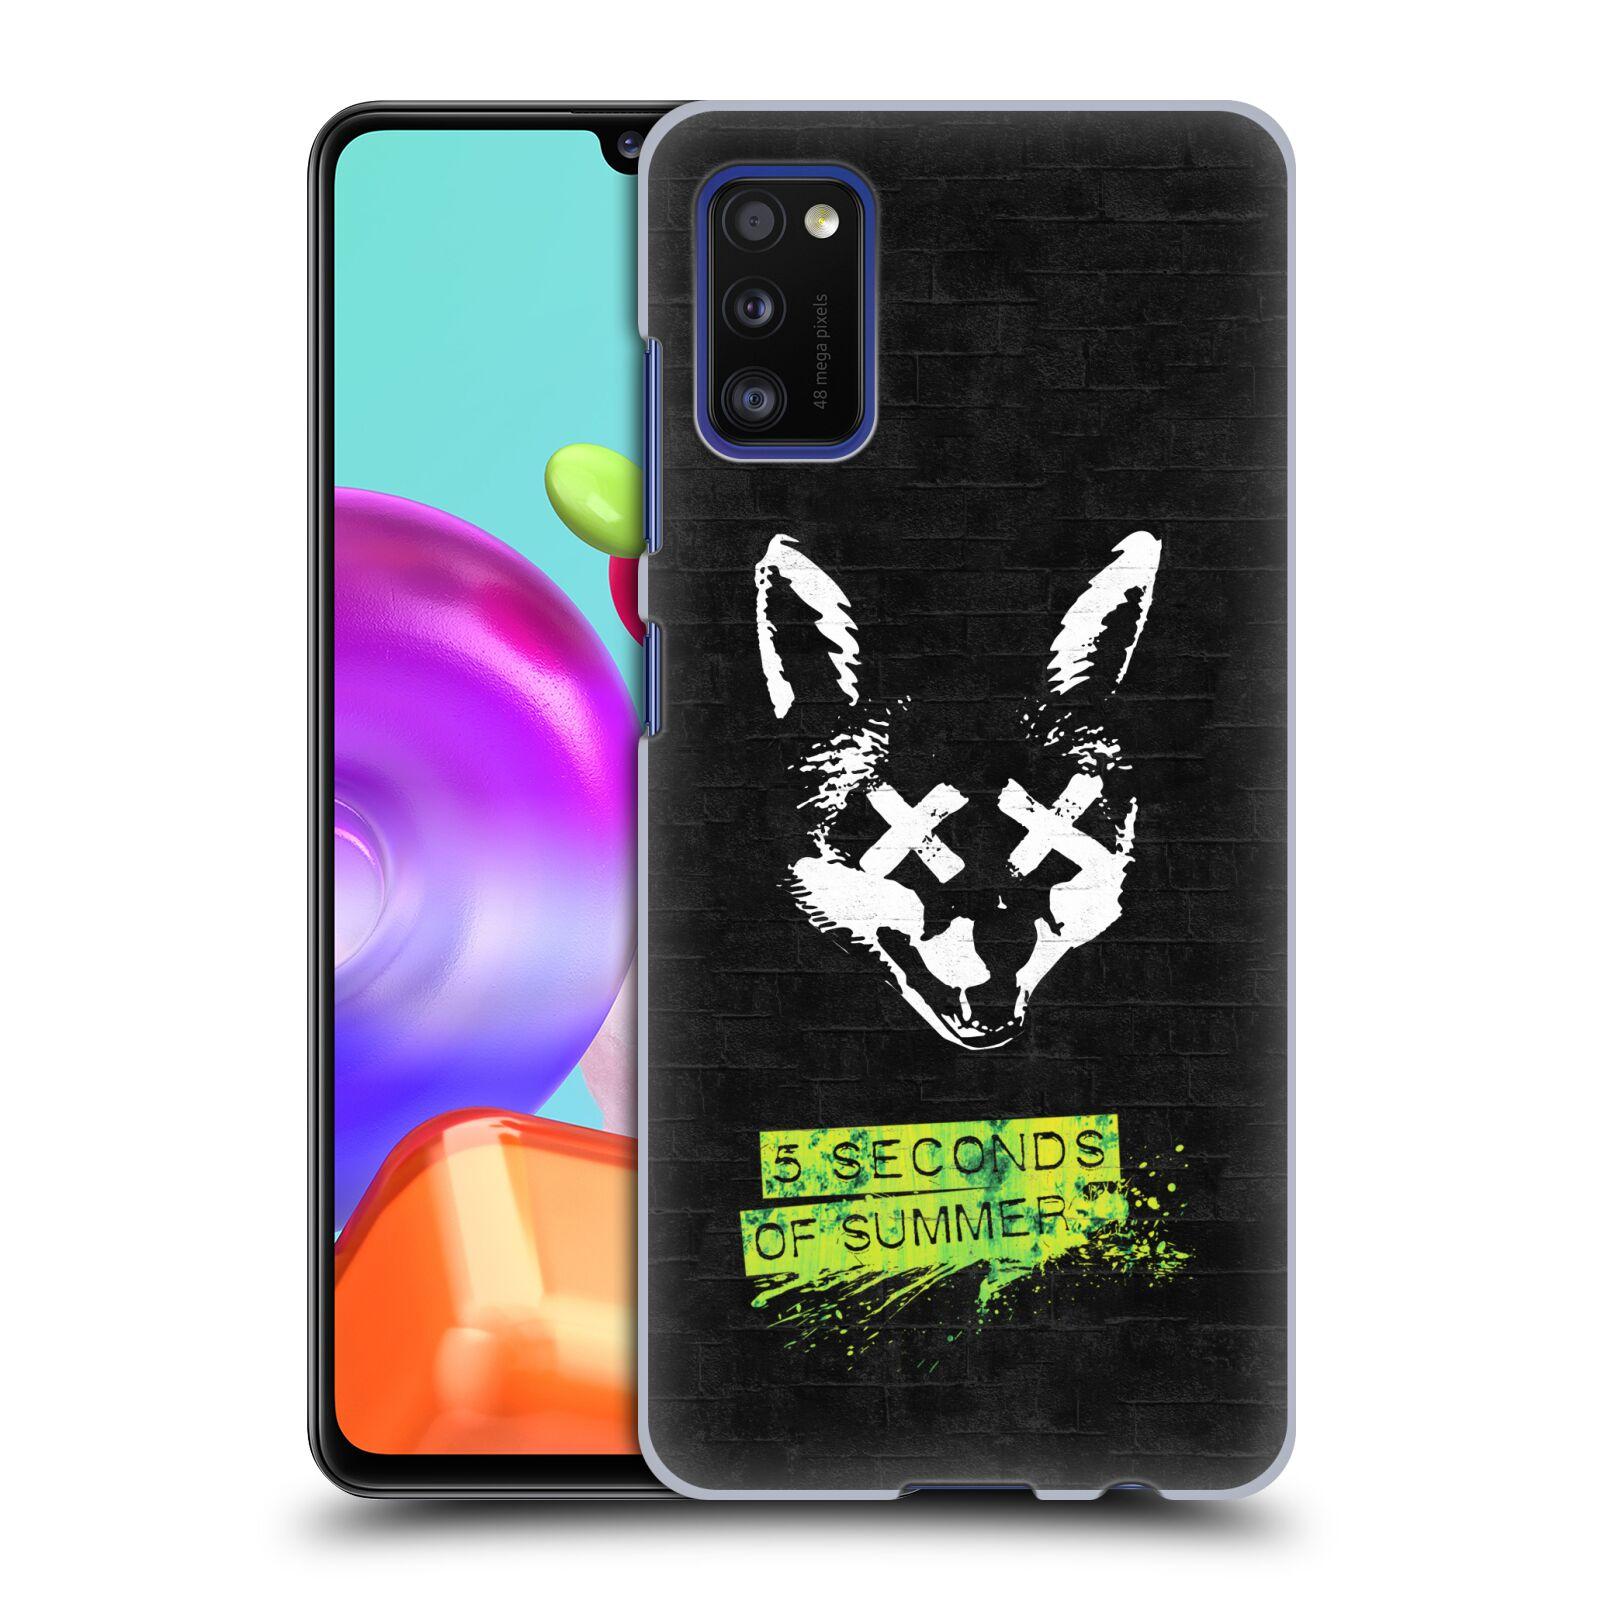 Plastové pouzdro na mobil Samsung Galaxy A41 - Head Case - 5 Seconds of Summer - Fox